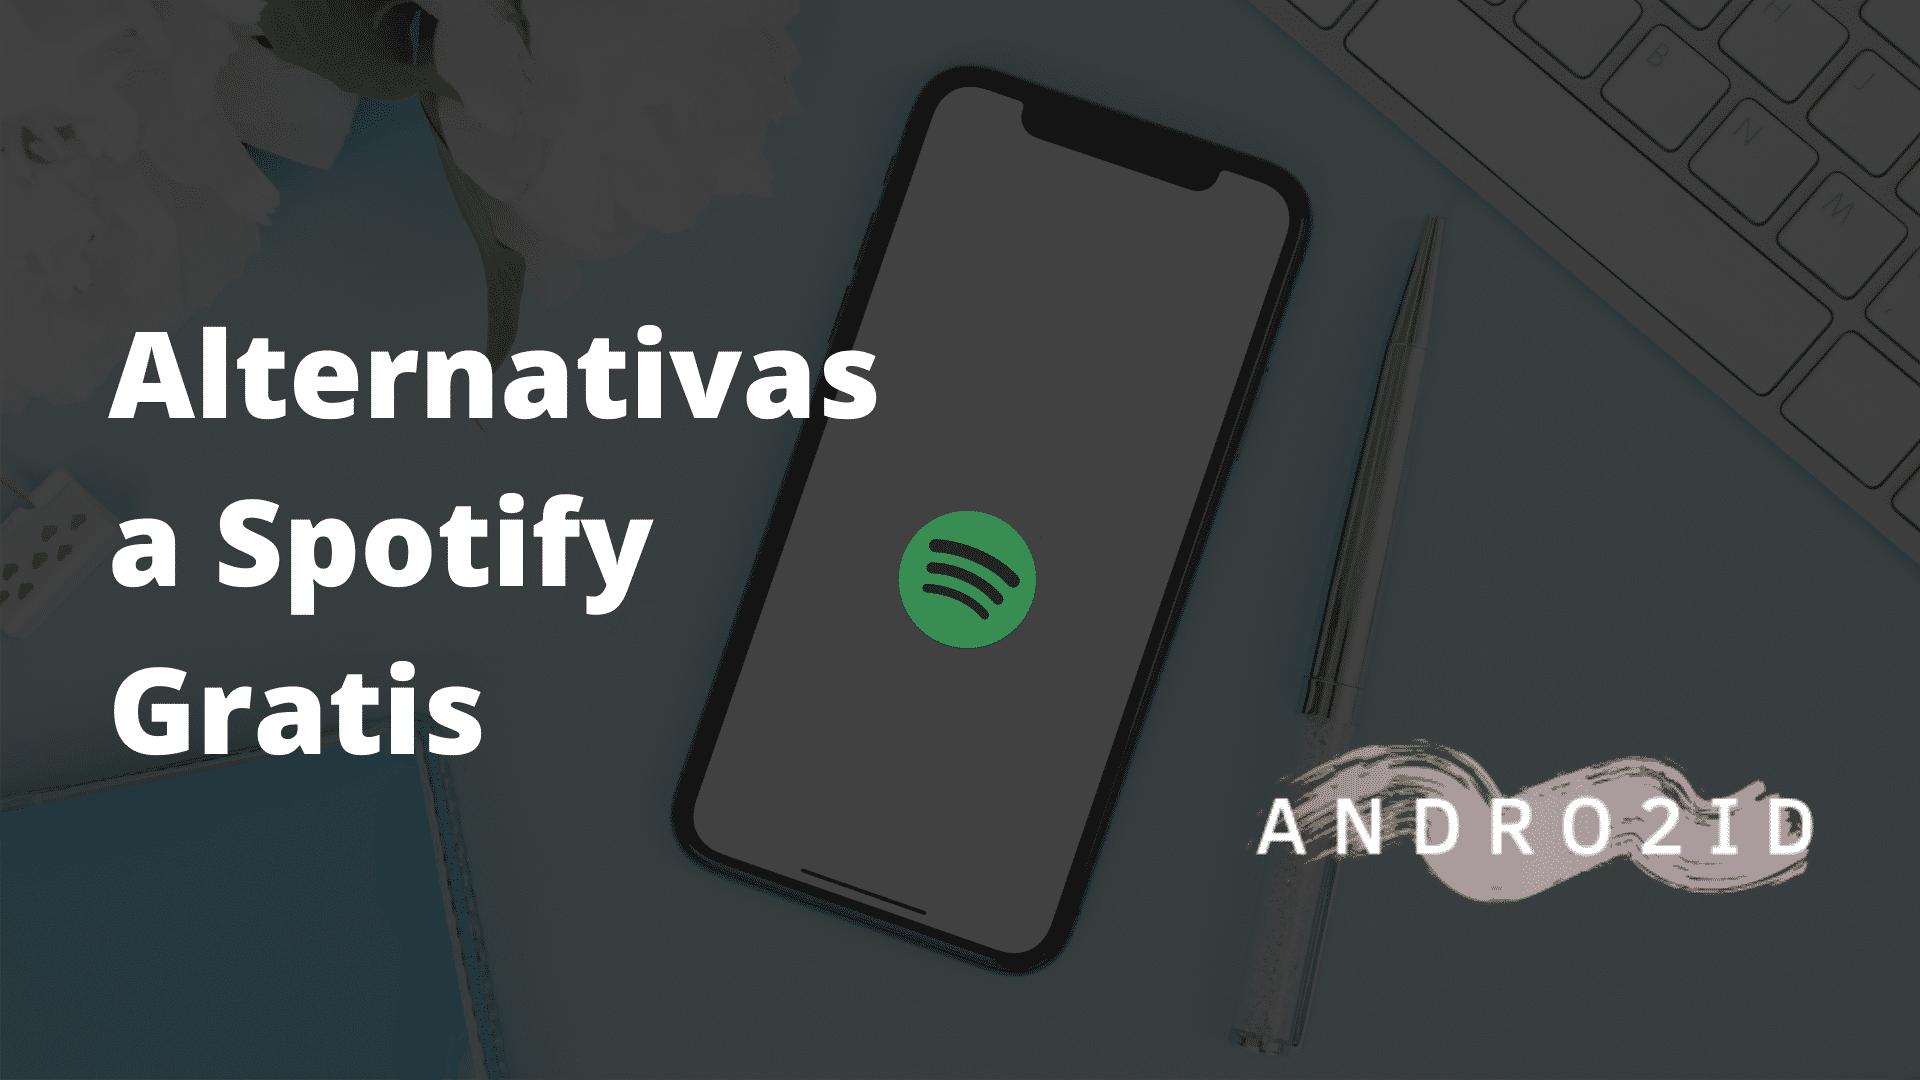 alternativas a spotify gratis